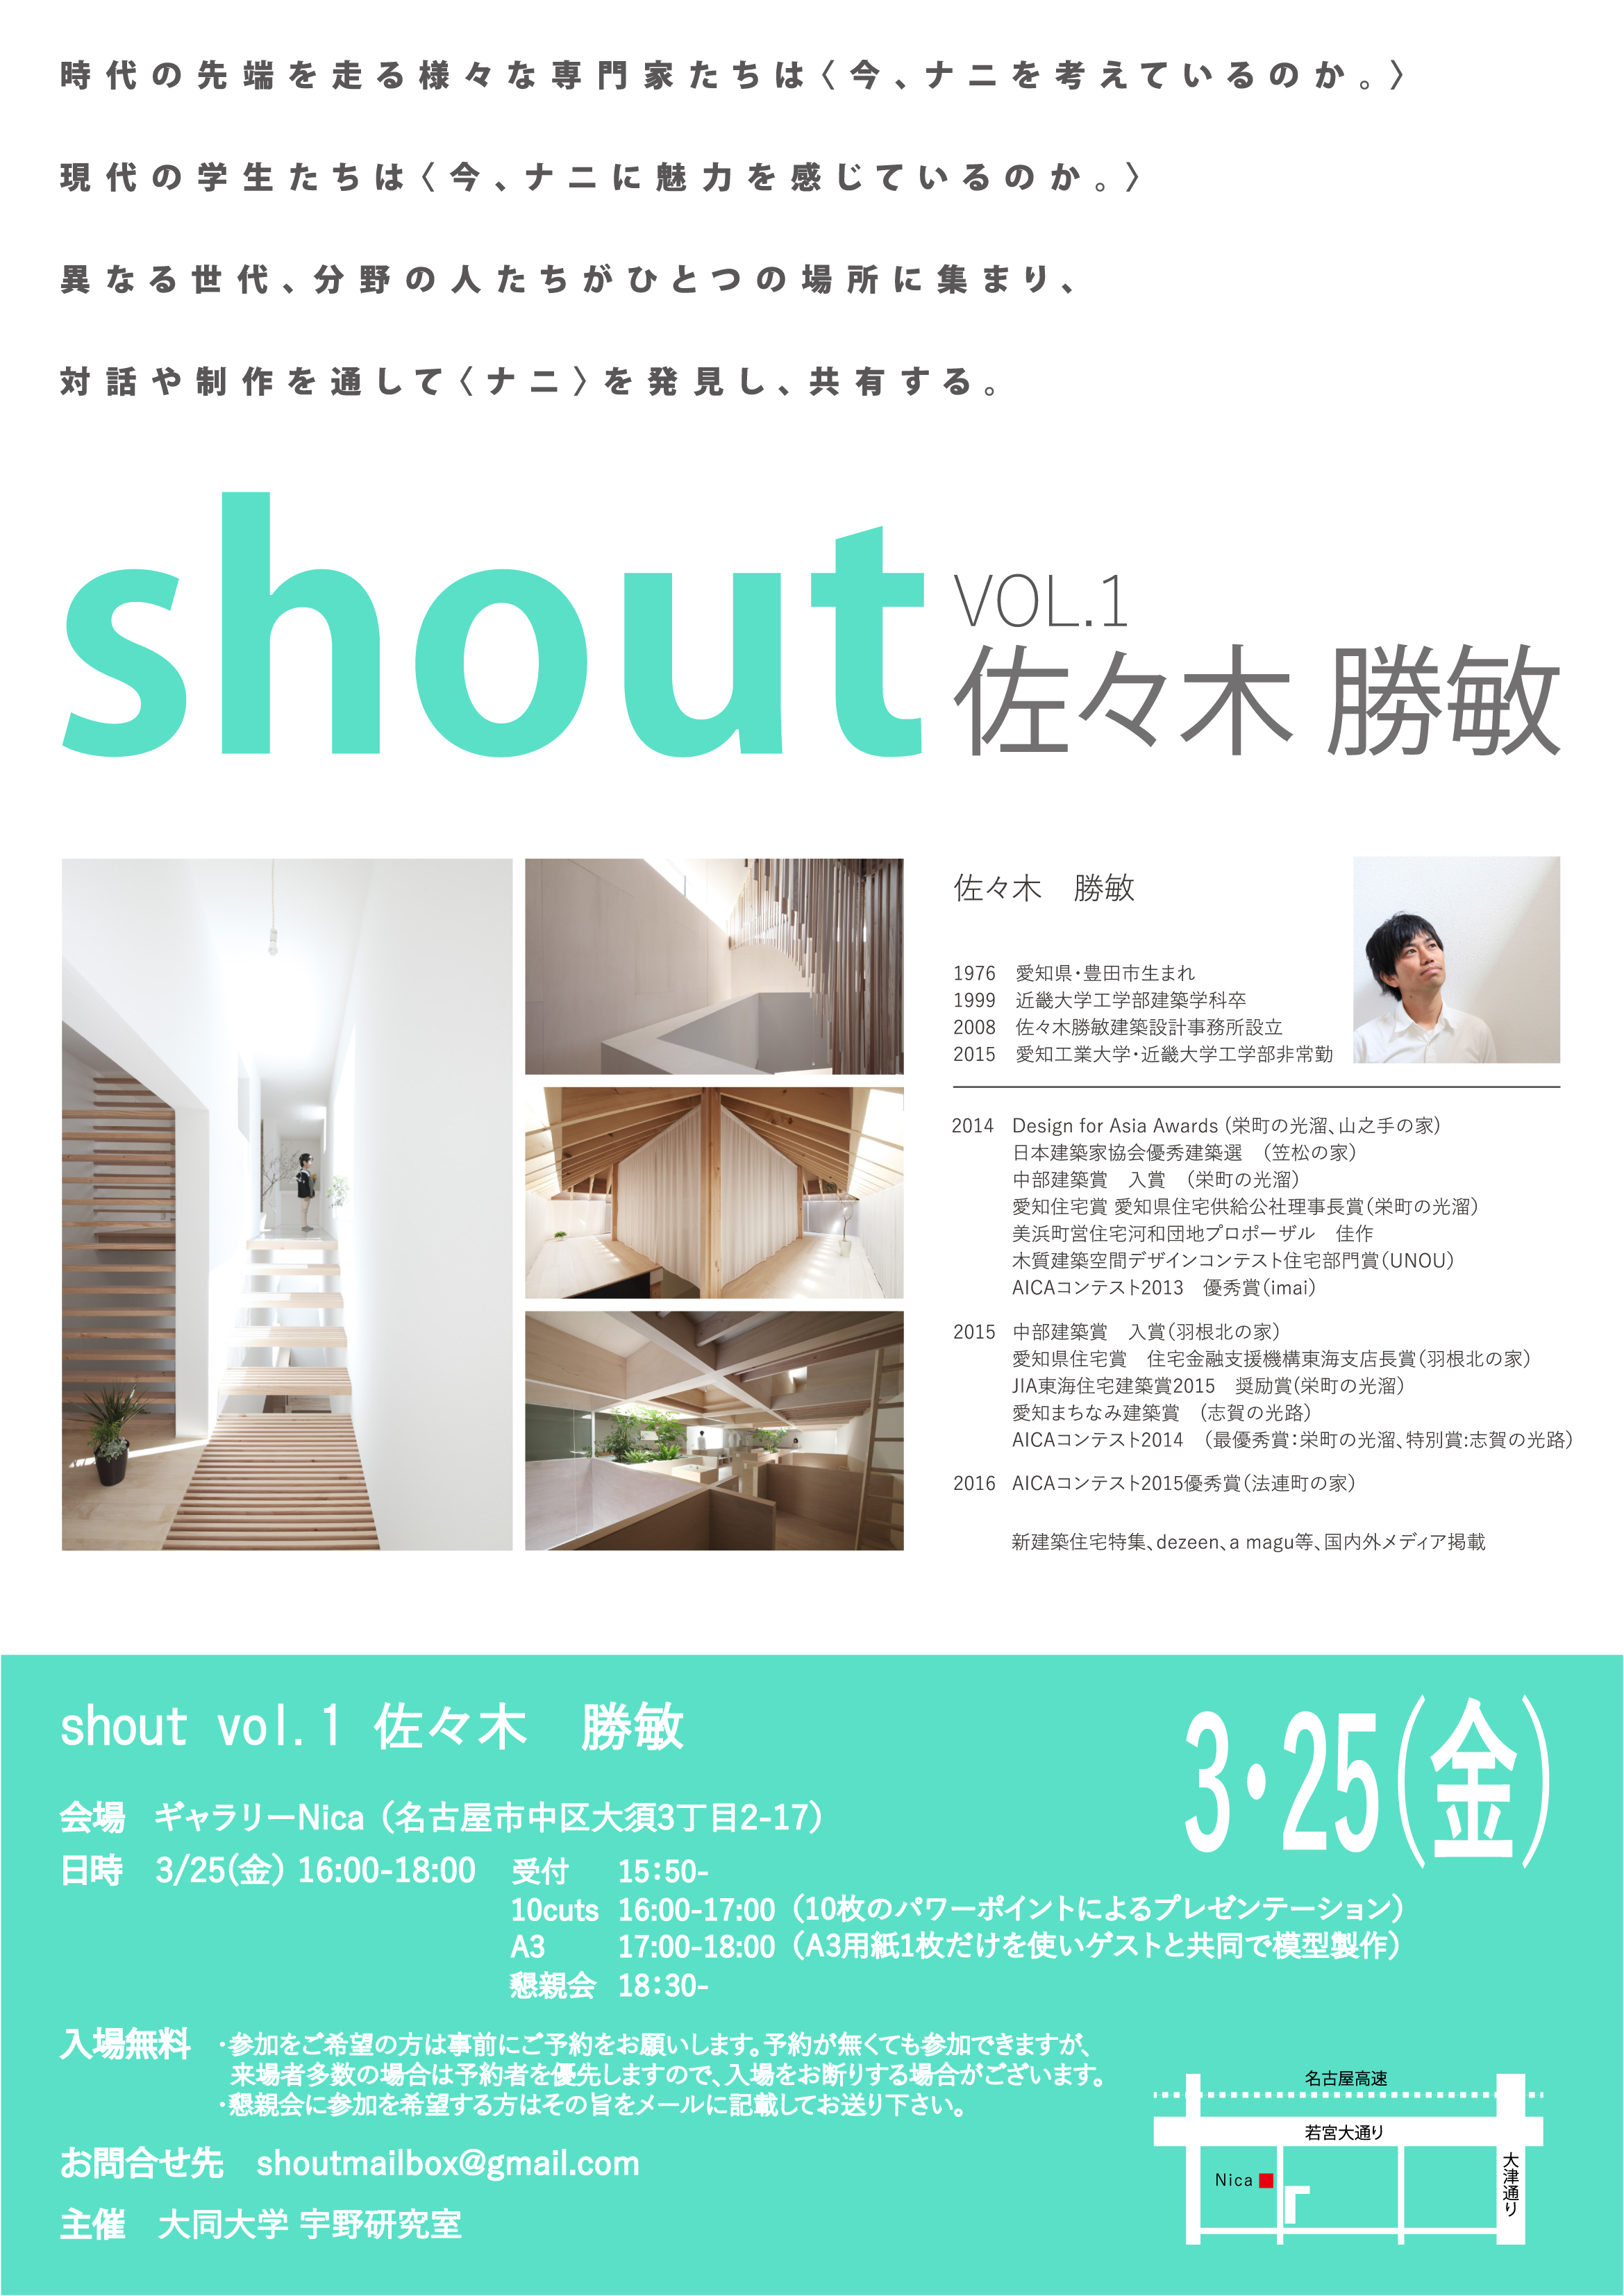 shout vol